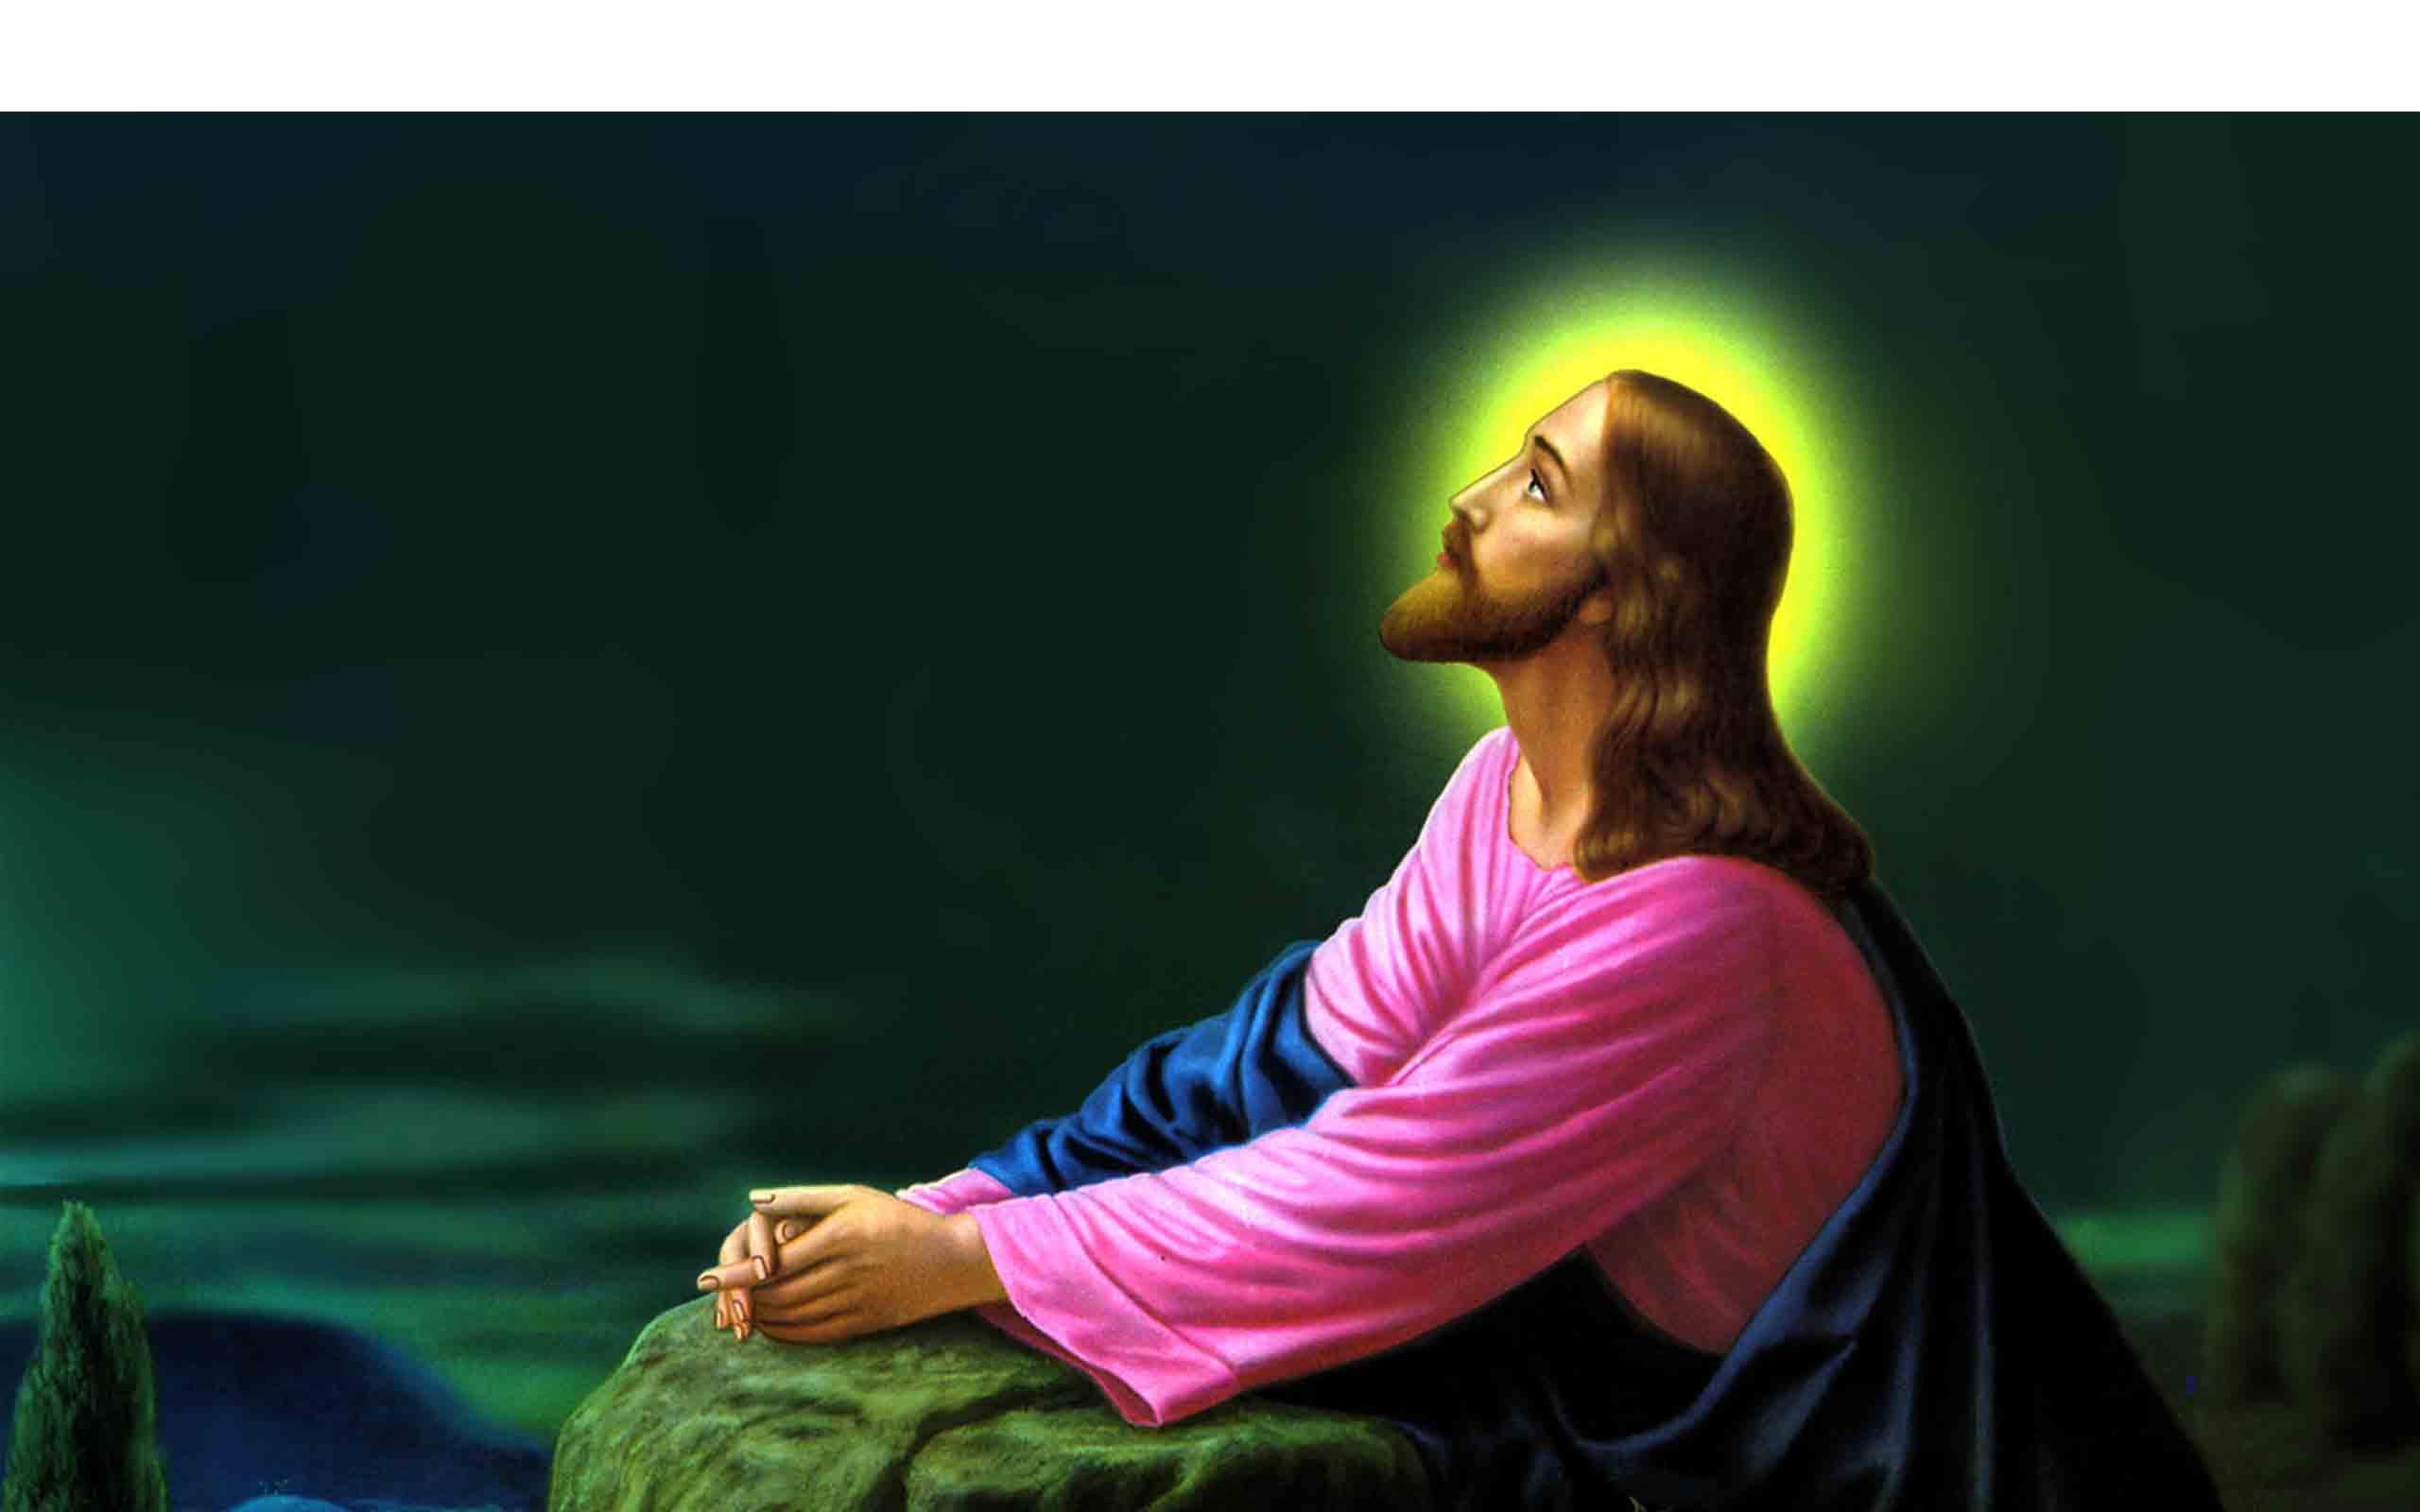 Jesus Wallpaper Hd Lord Jesus Christ Painting Copy Brethren Assembly Kumbazha